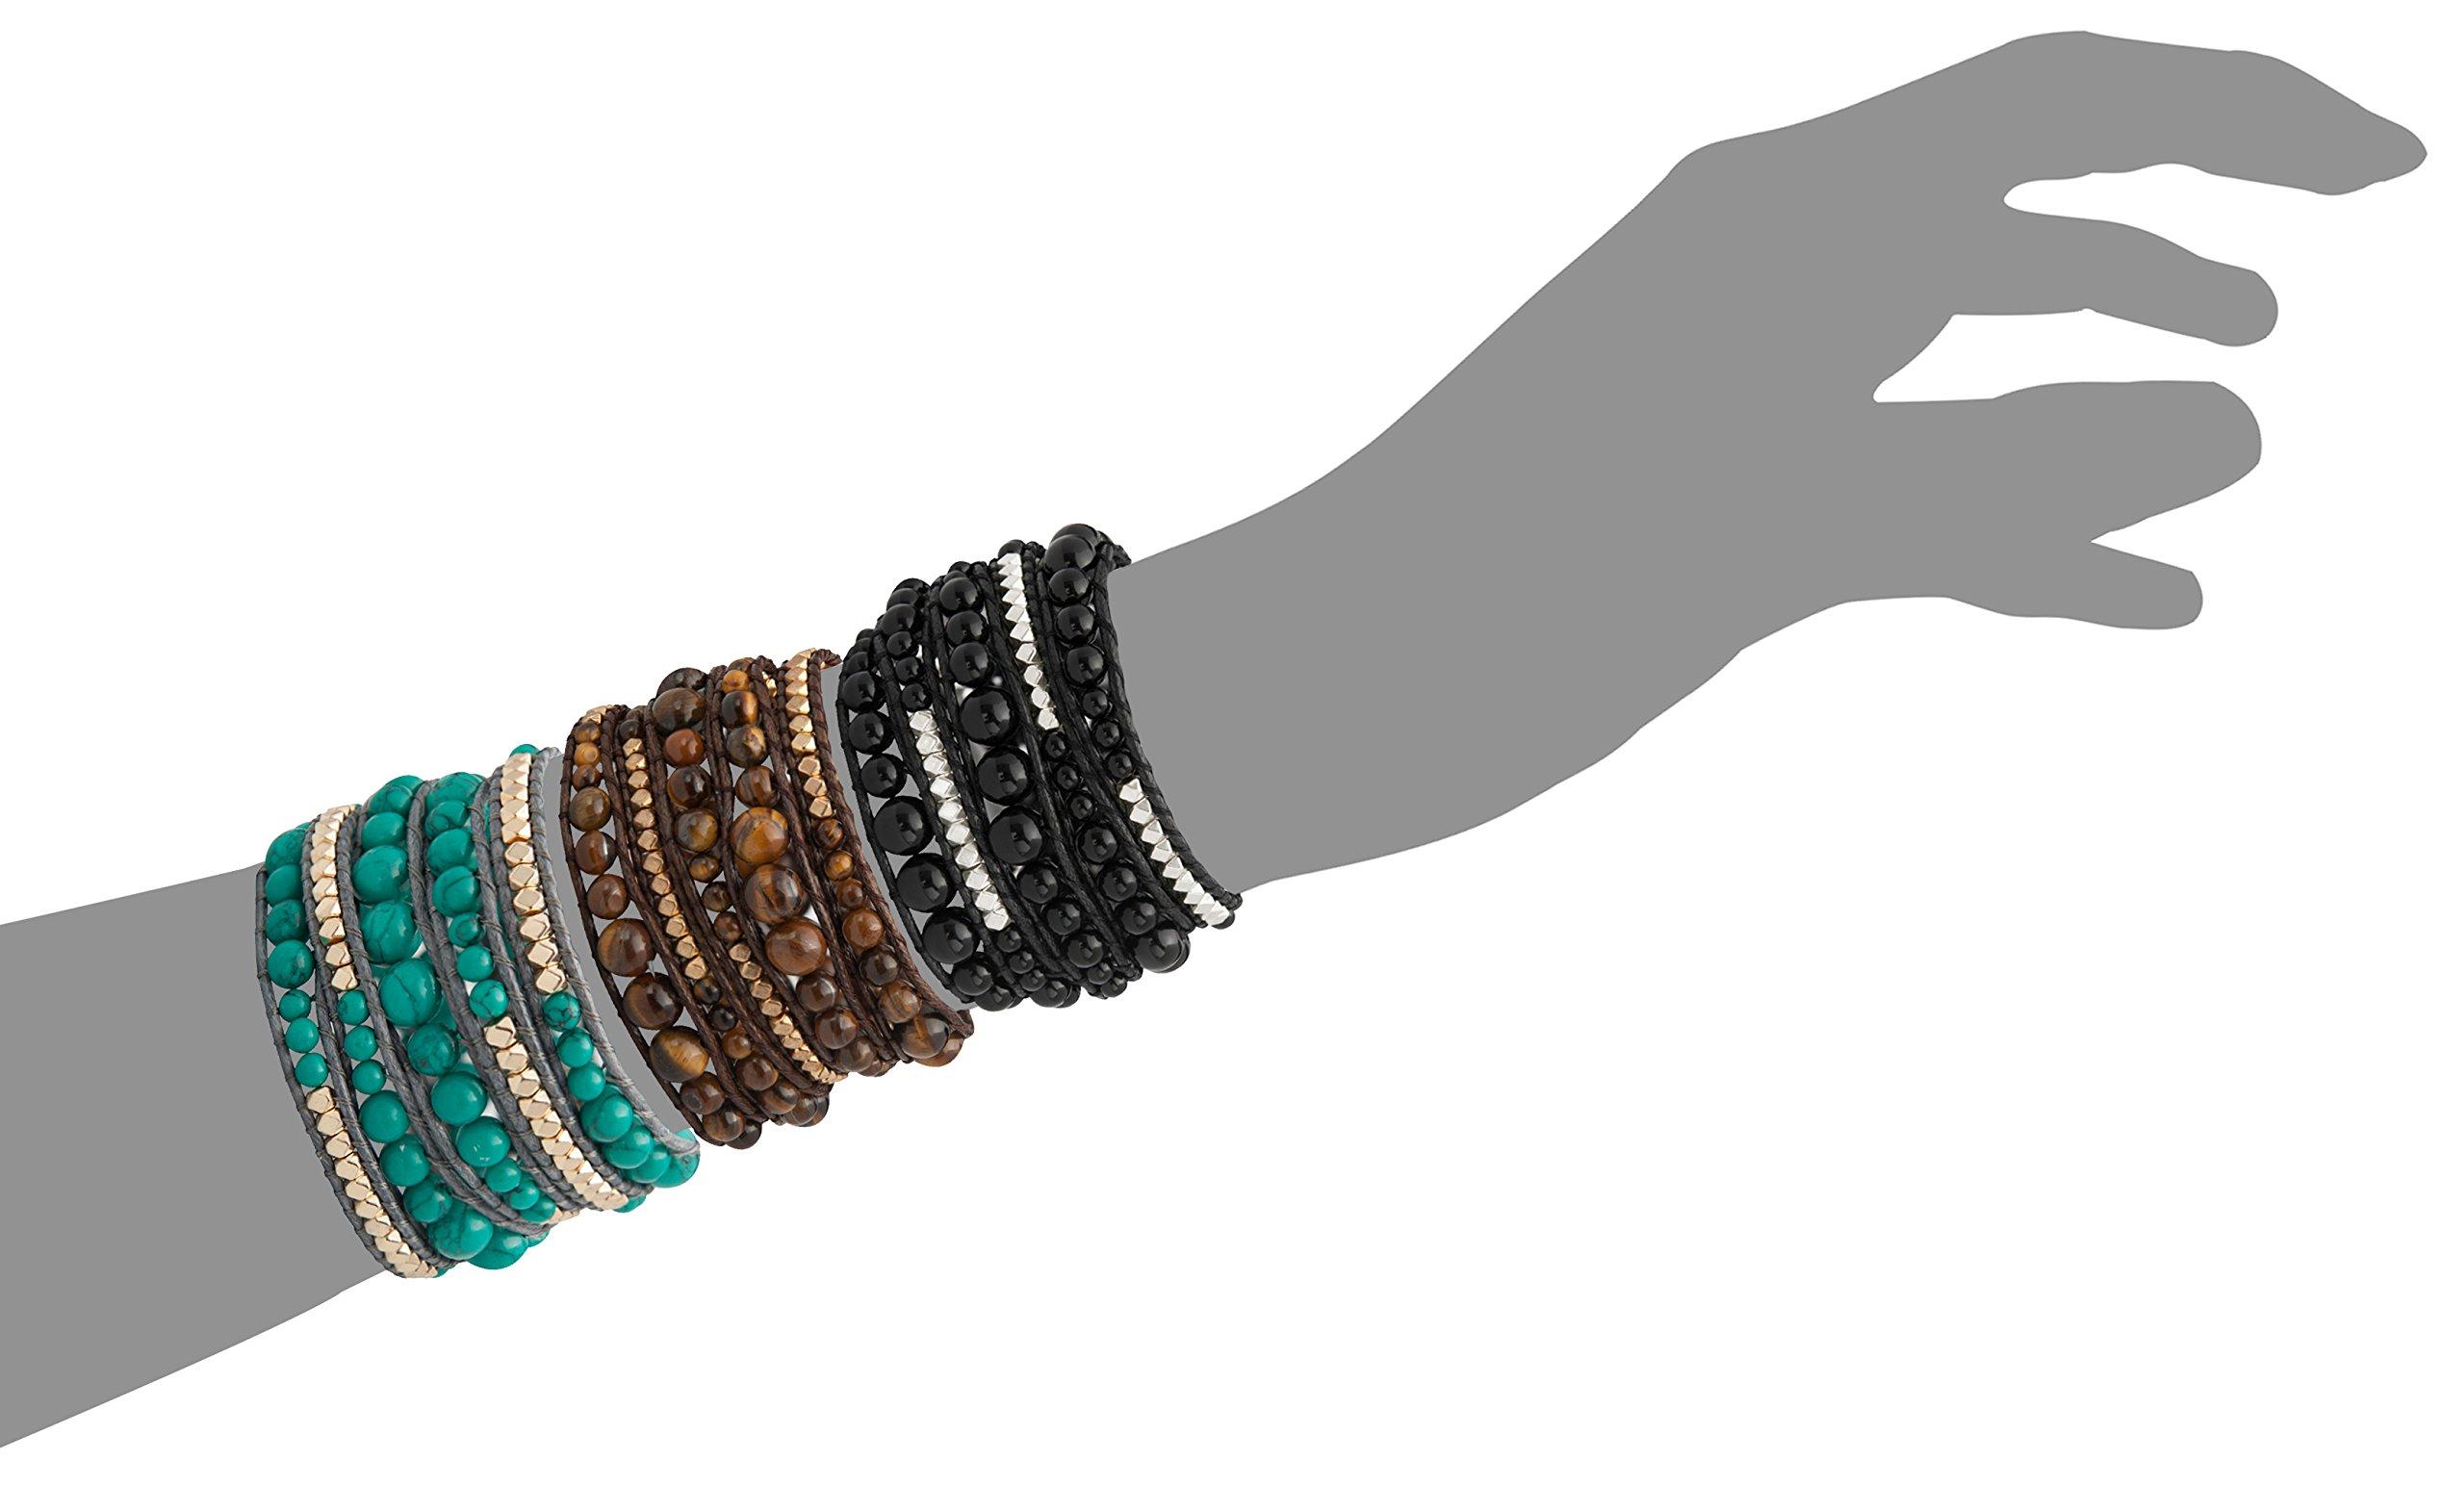 Genuine Stones 5 Wrap Bracelet - Bangle Cuff Rope With Beads - Unisex - Free Size Adjustable (Turquoise) by Sun Life Style (Image #7)